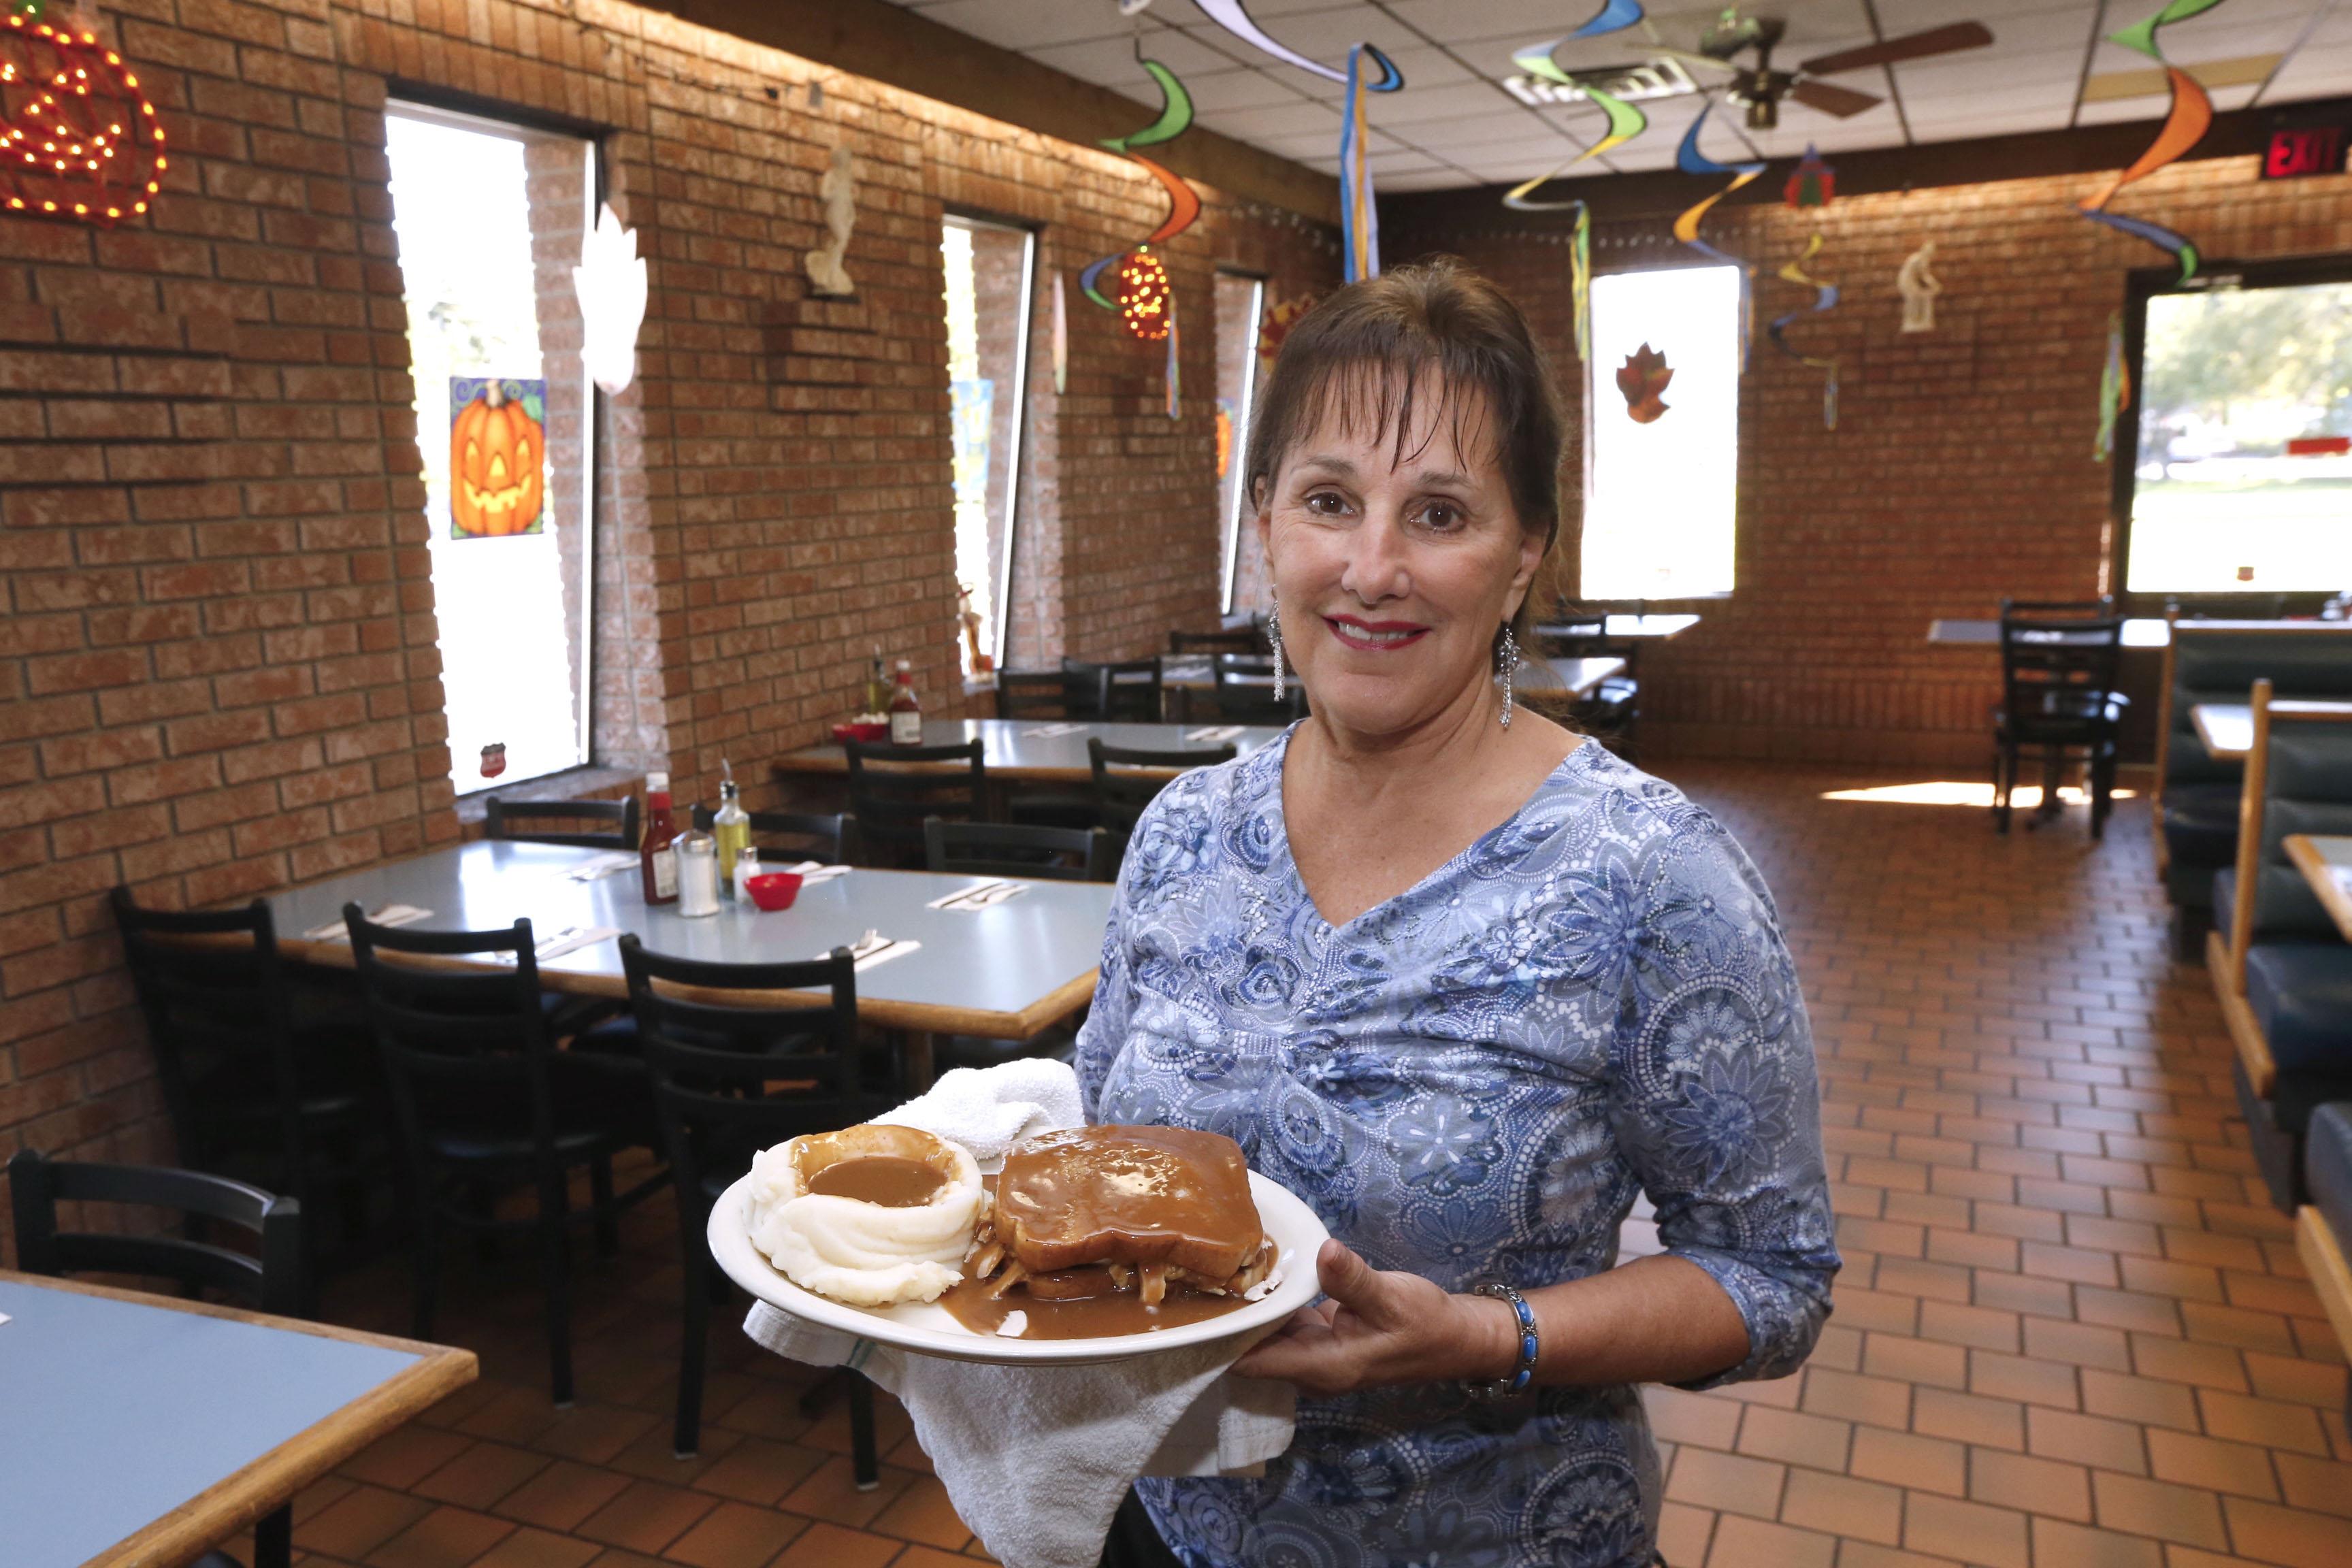 Head server Rose Matyjasik serves the open face fresh turkey sandwich, gravy and mashed potatoes at the  Seneca Towne restaurant.   (Robert Kirkham/Buffalo News)